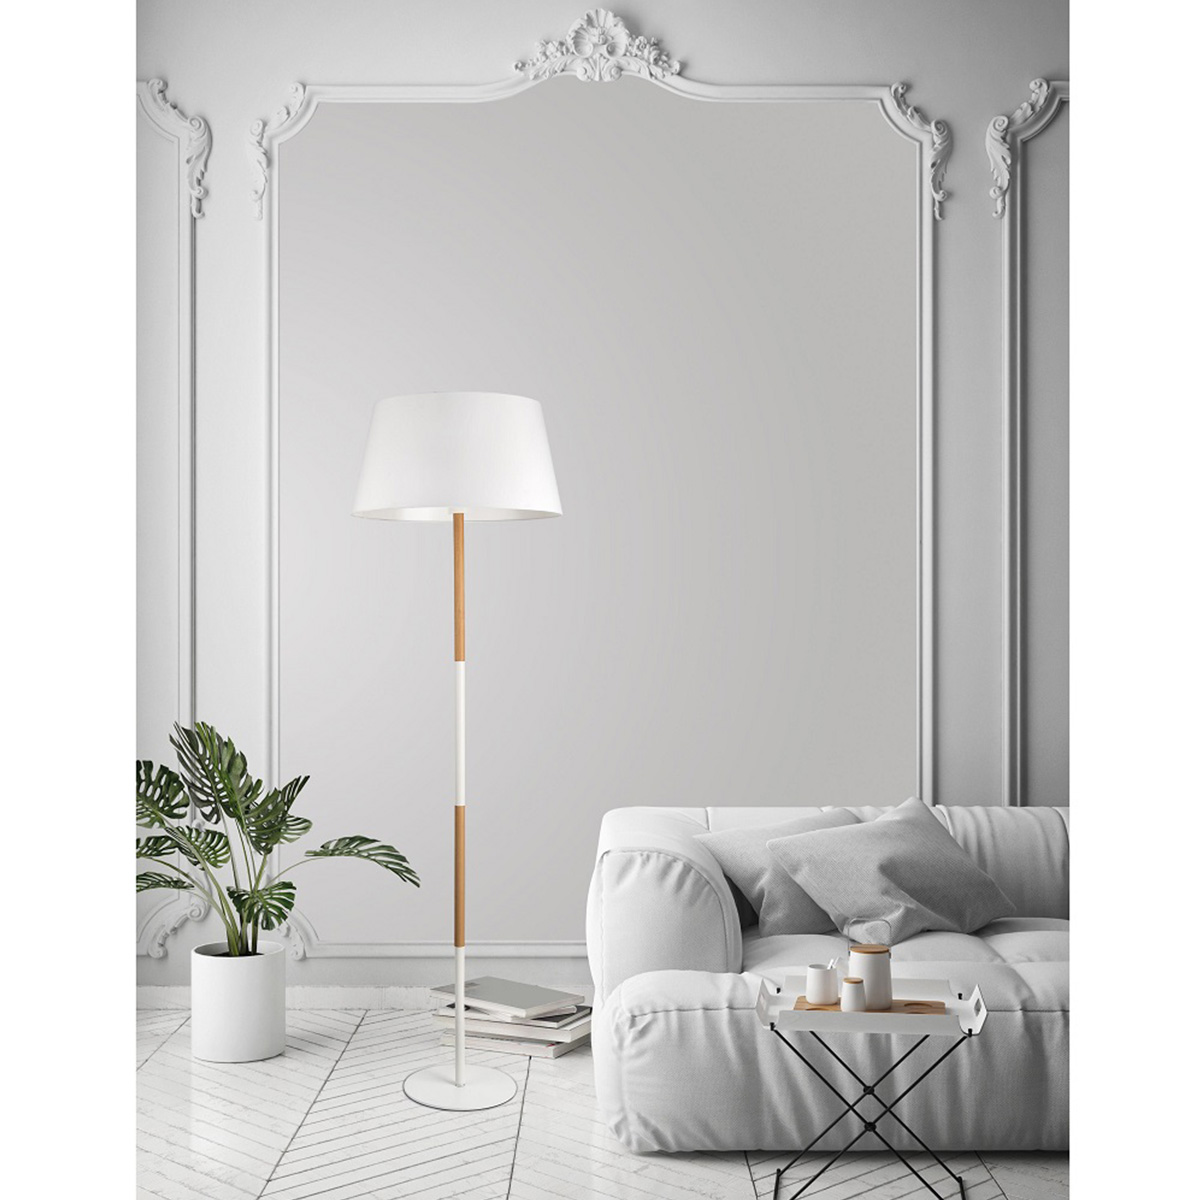 Podna lampa ARRIGO 7605184